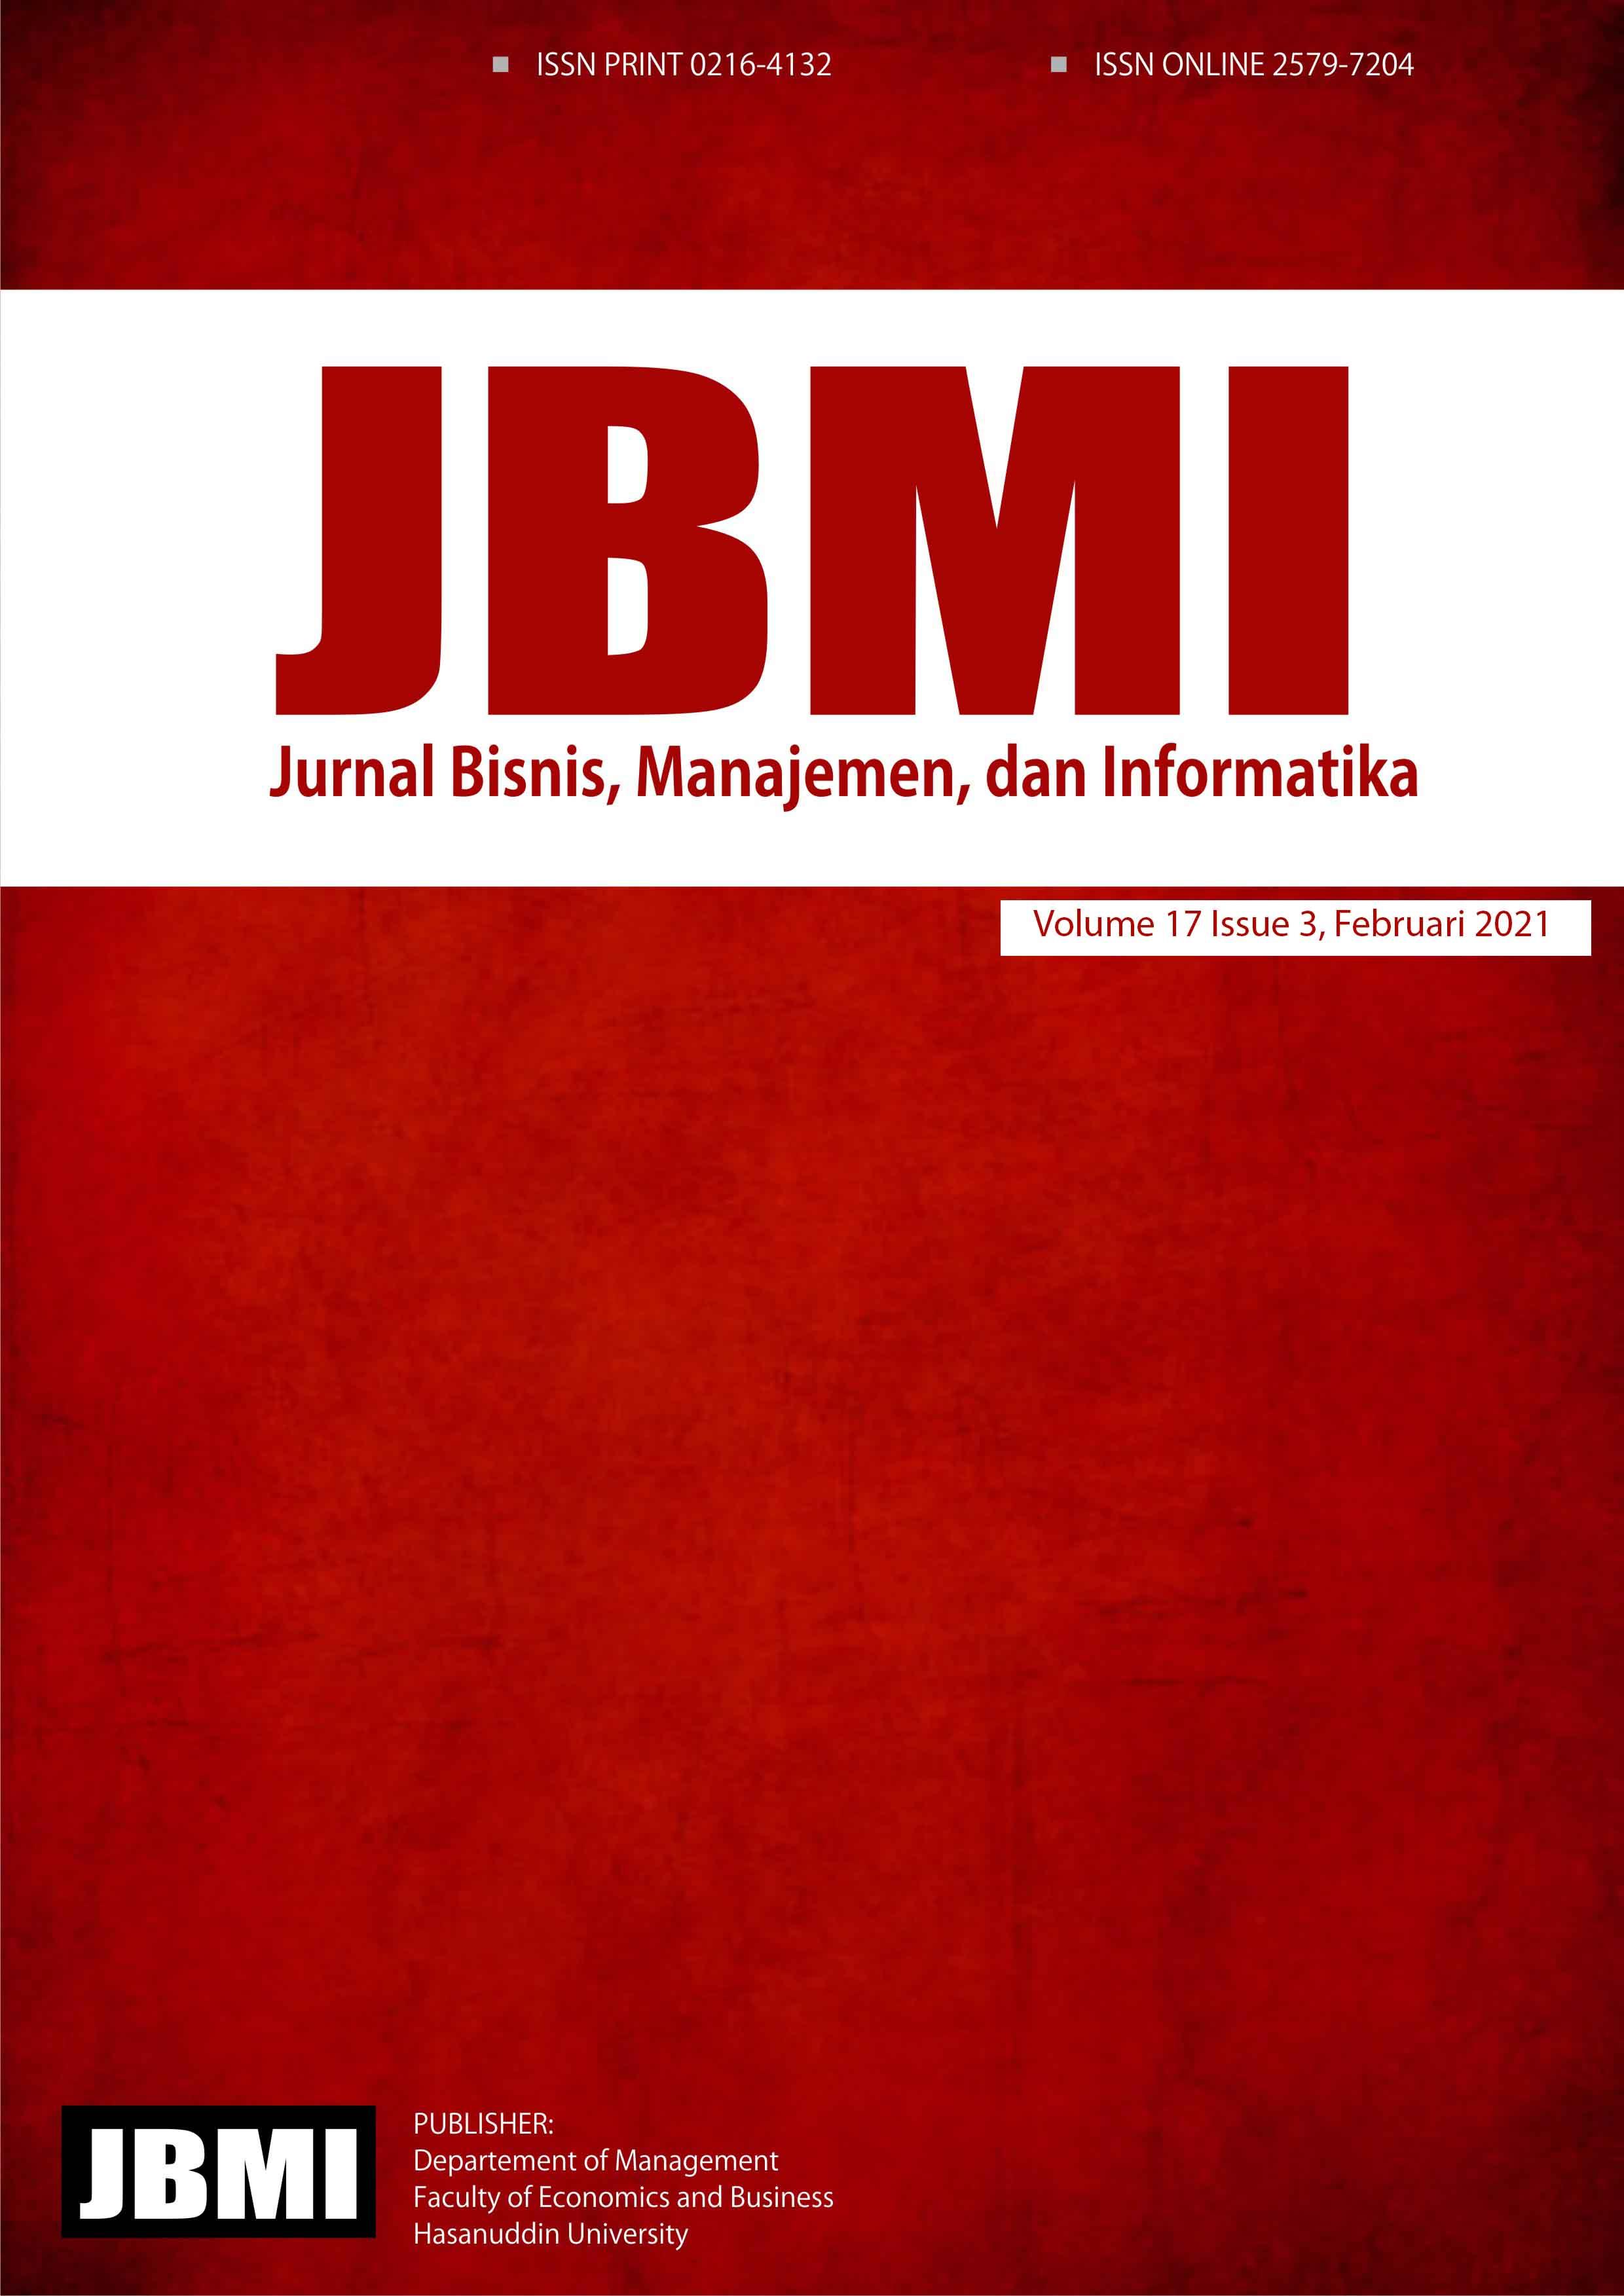 JBMI Volume 17, No 3, Februari 2021